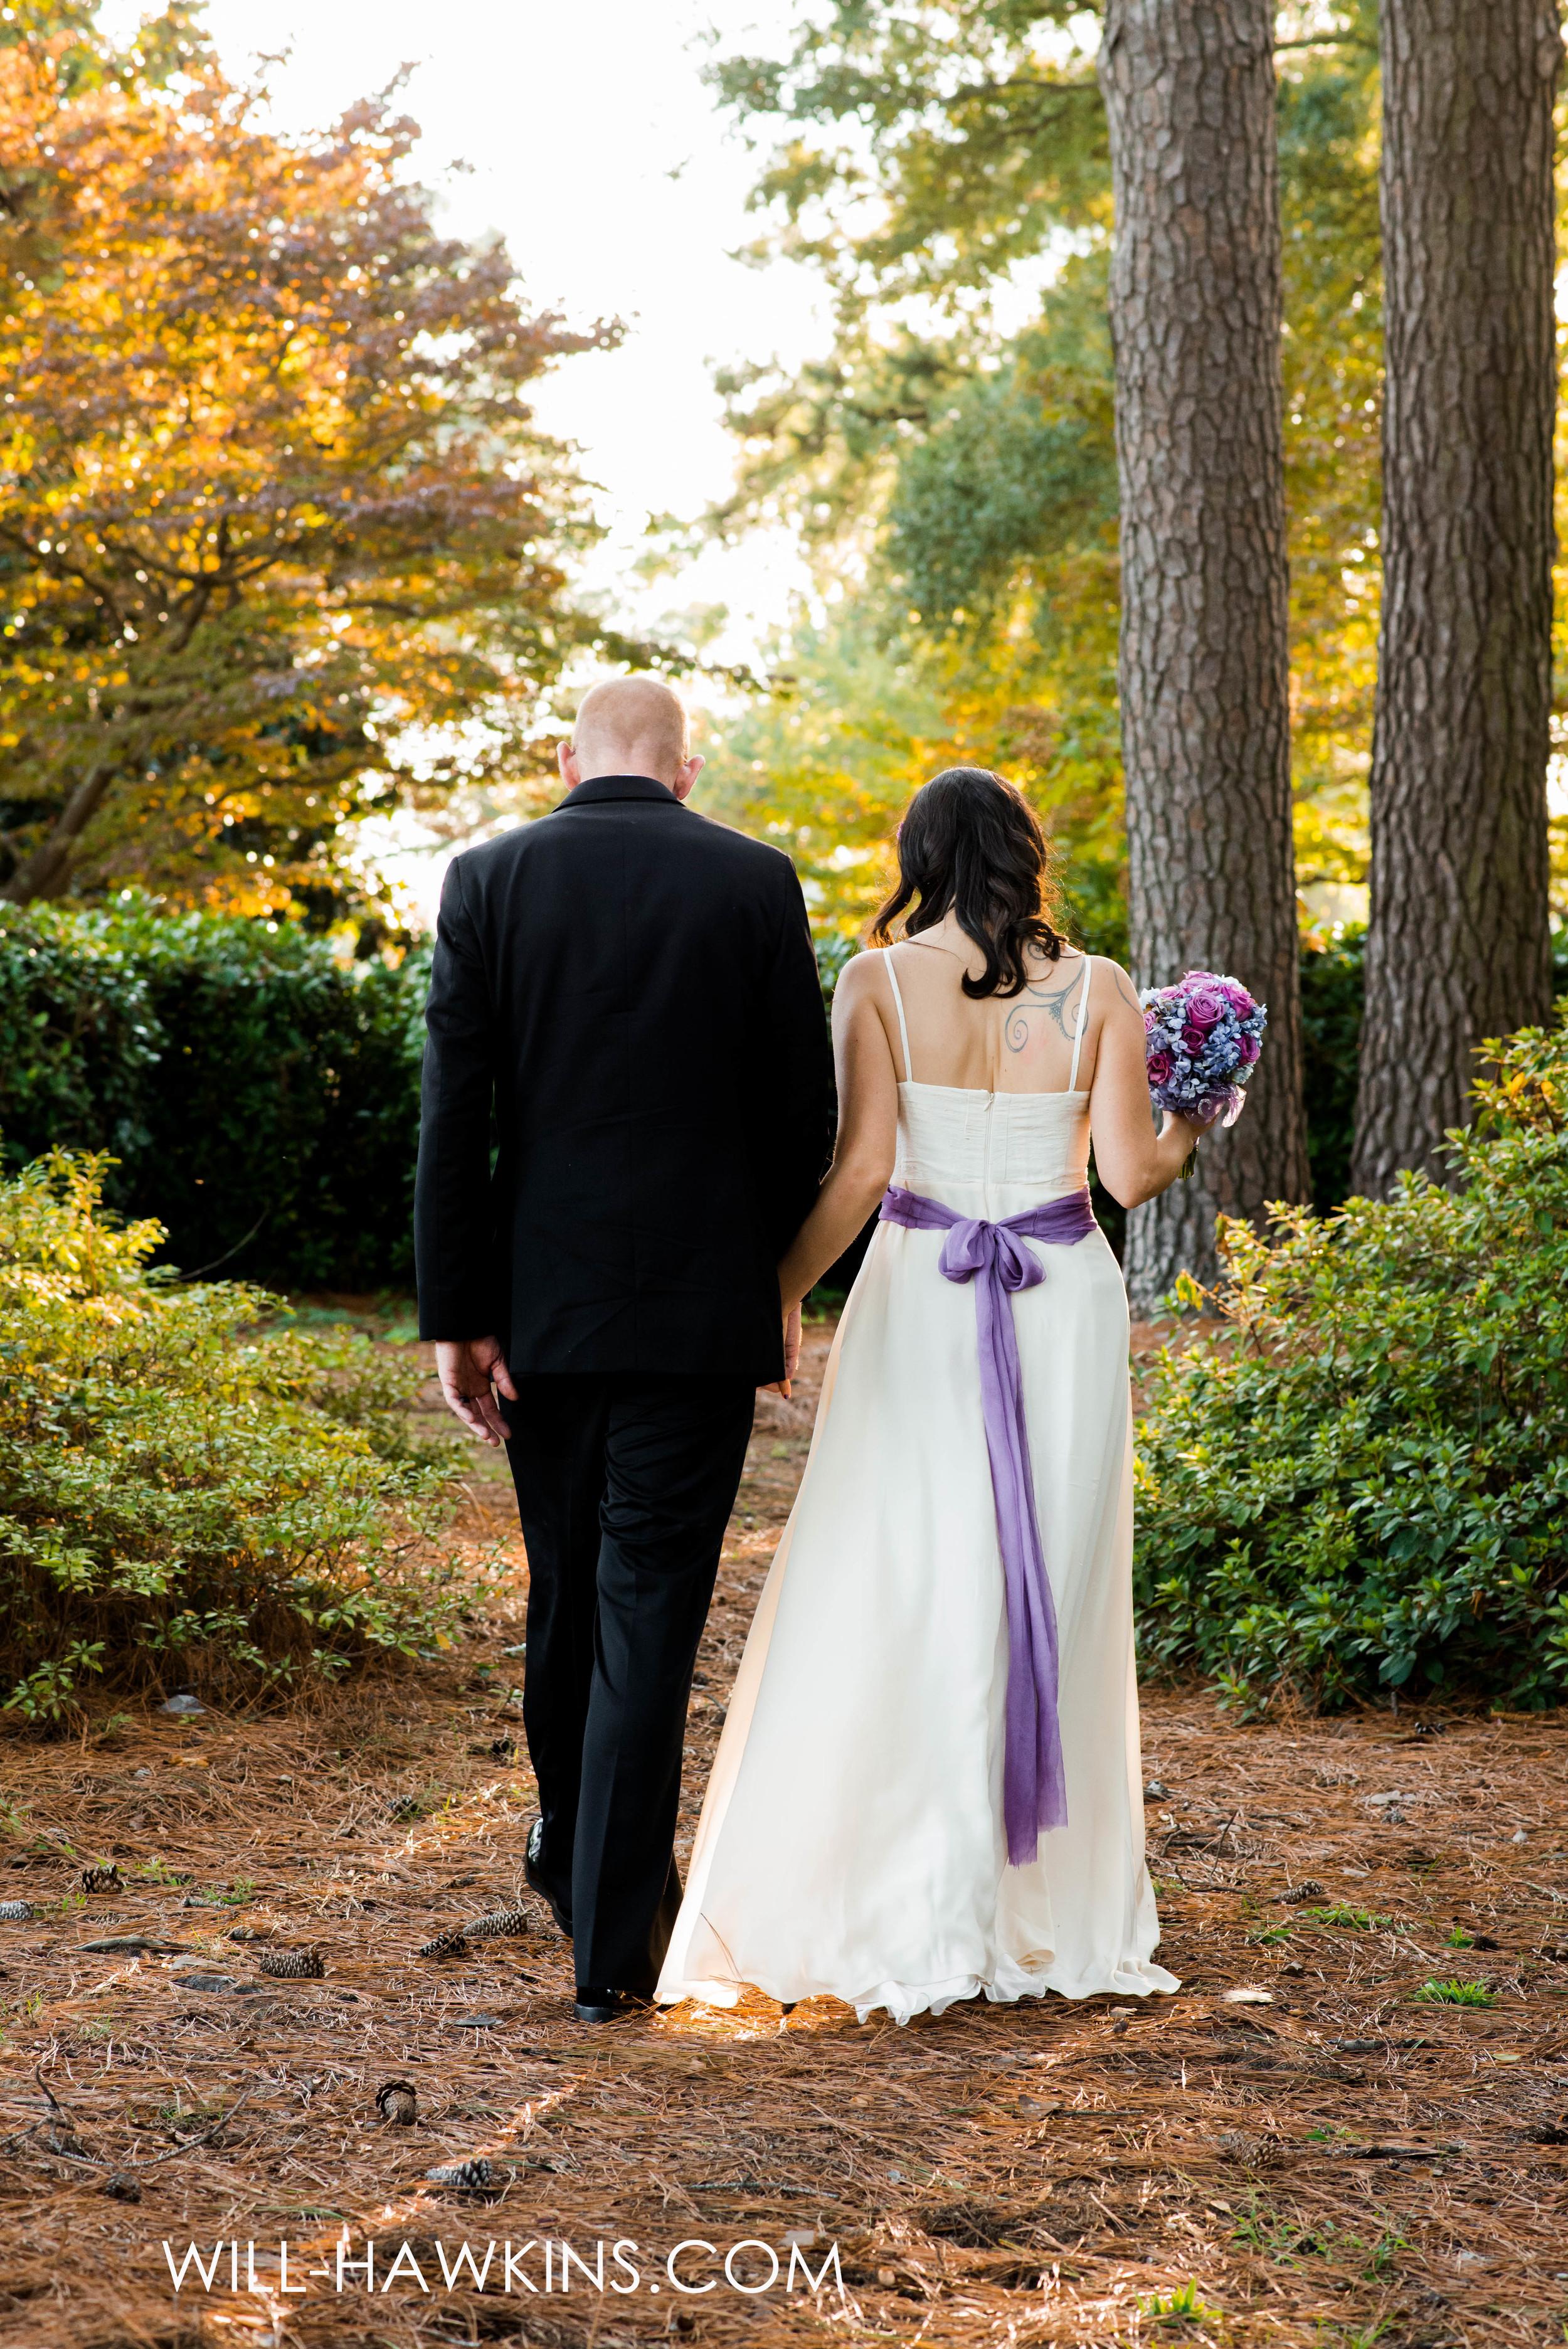 Suffolk Wedding Photographer Will Hawkins Photography